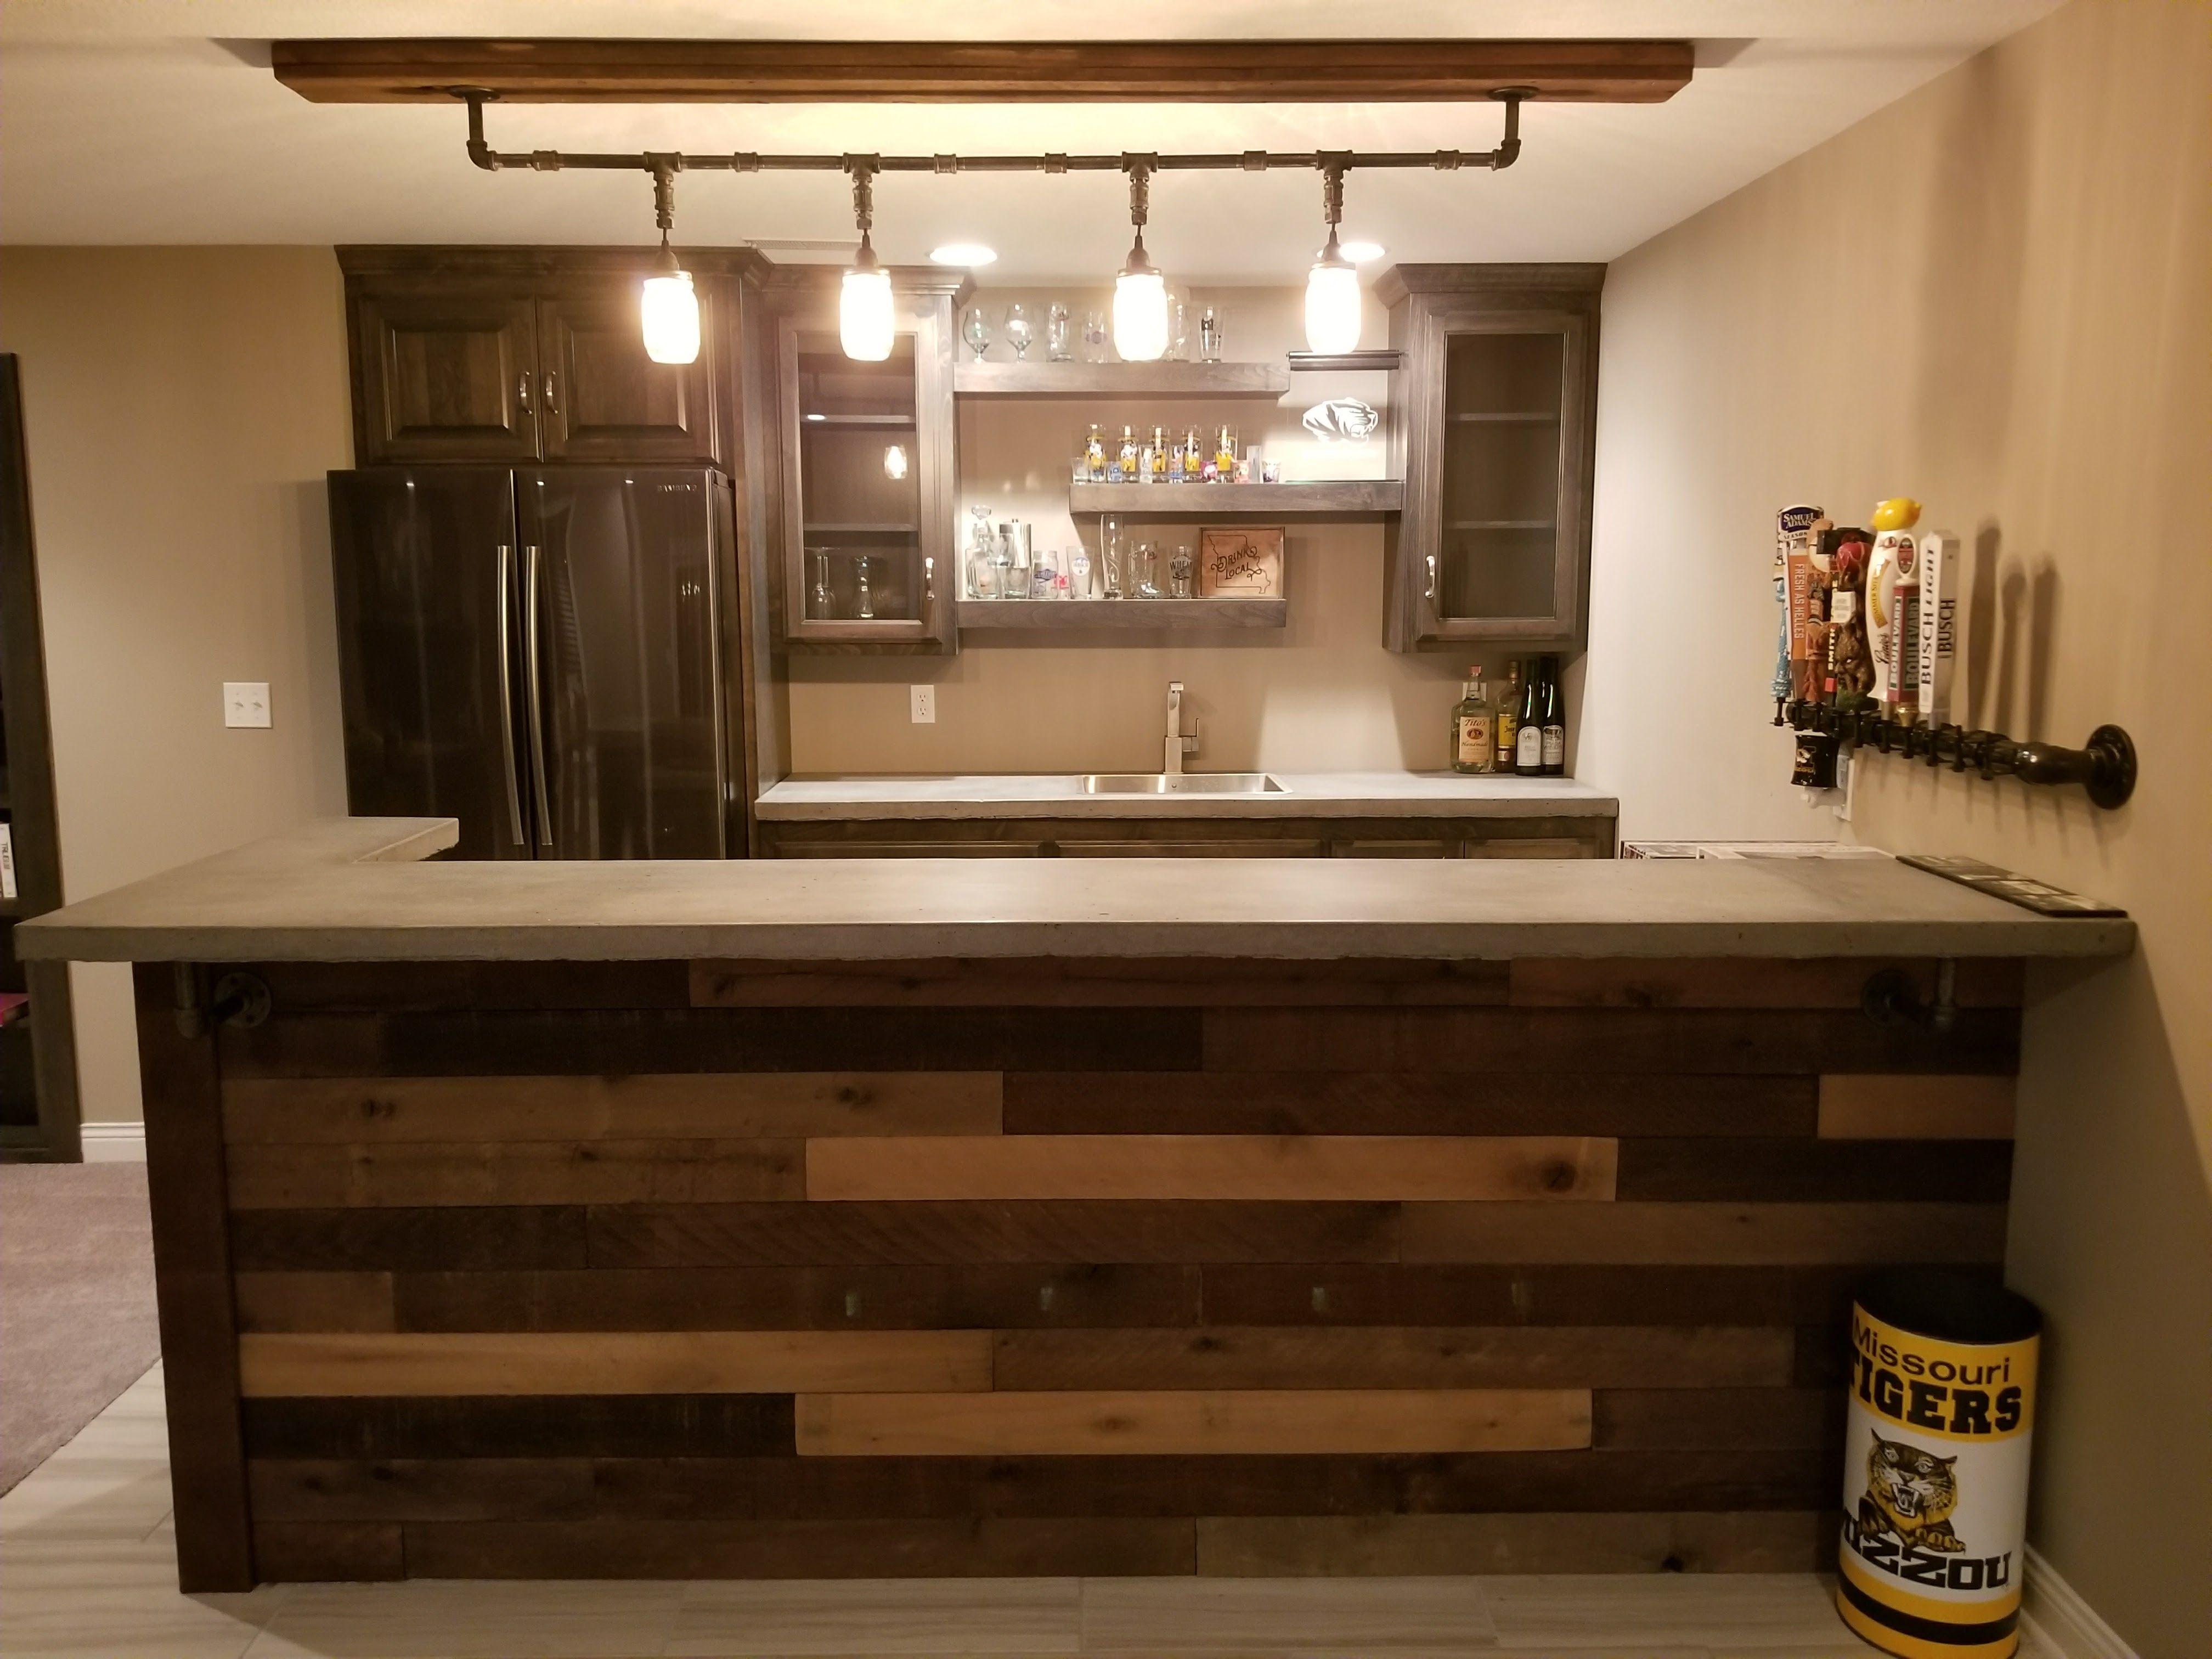 Pallet Wood Bar With Concrete Counter Tops Mason Jar Hanging Light Floating Shelves Concrete Counter Bathroom Furniture Vanity Concrete Countertops